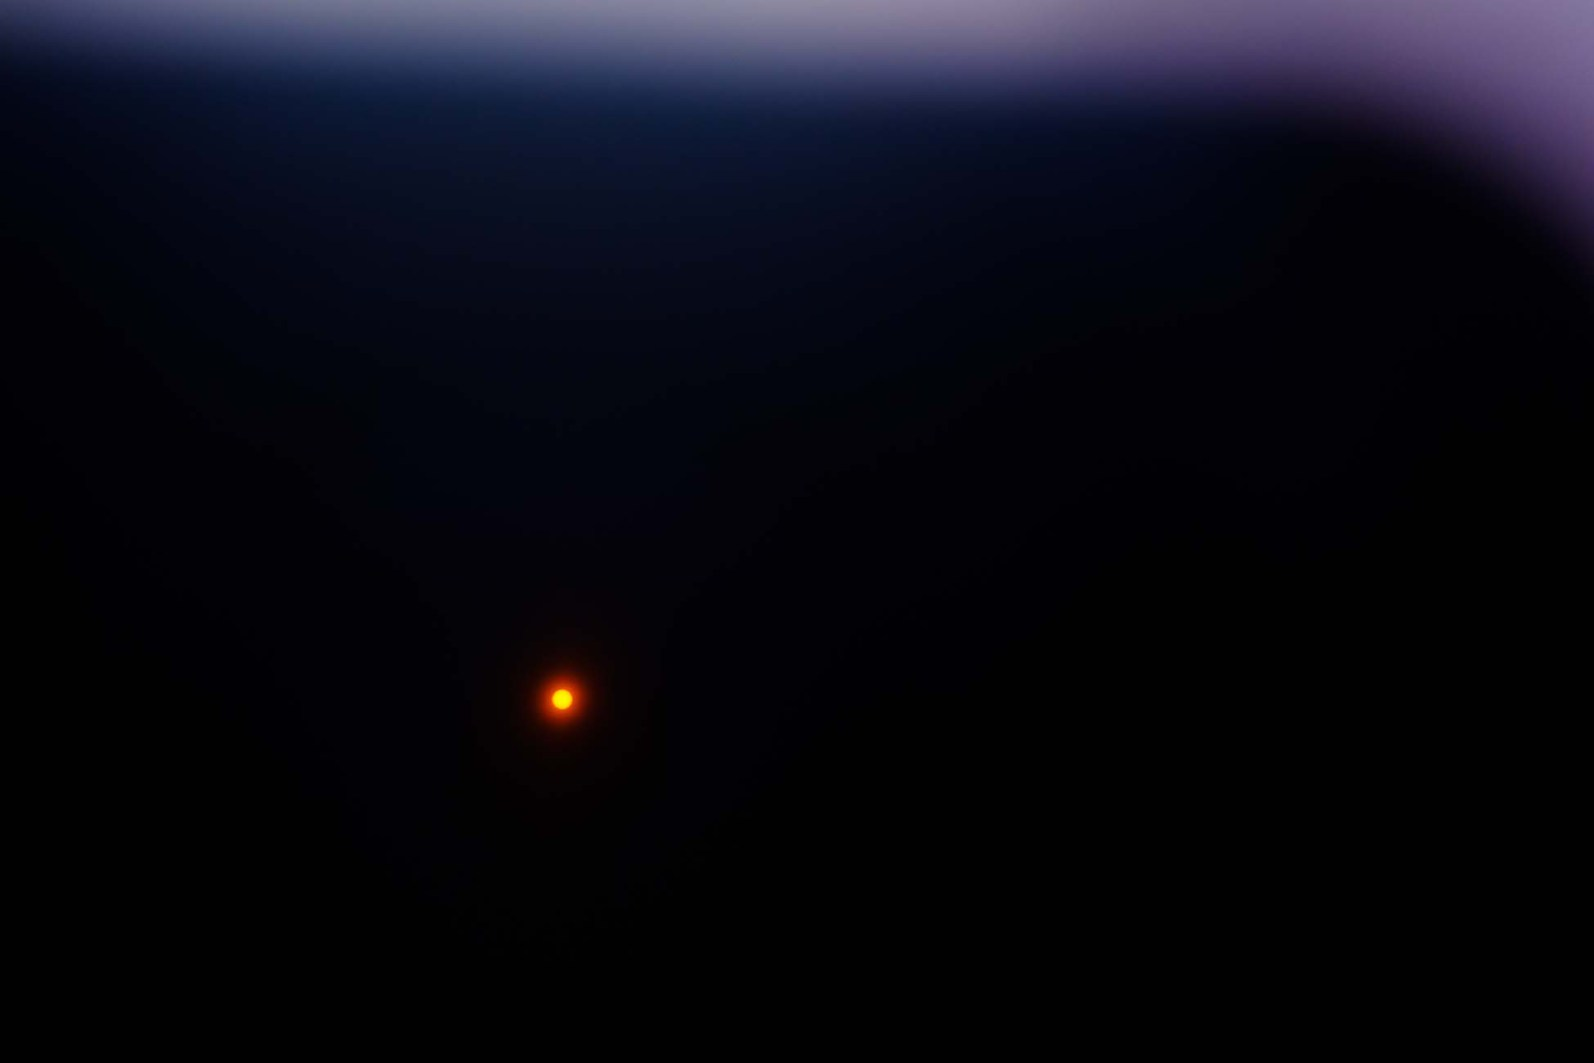 Solar eclipse Monday August 21, 2017.